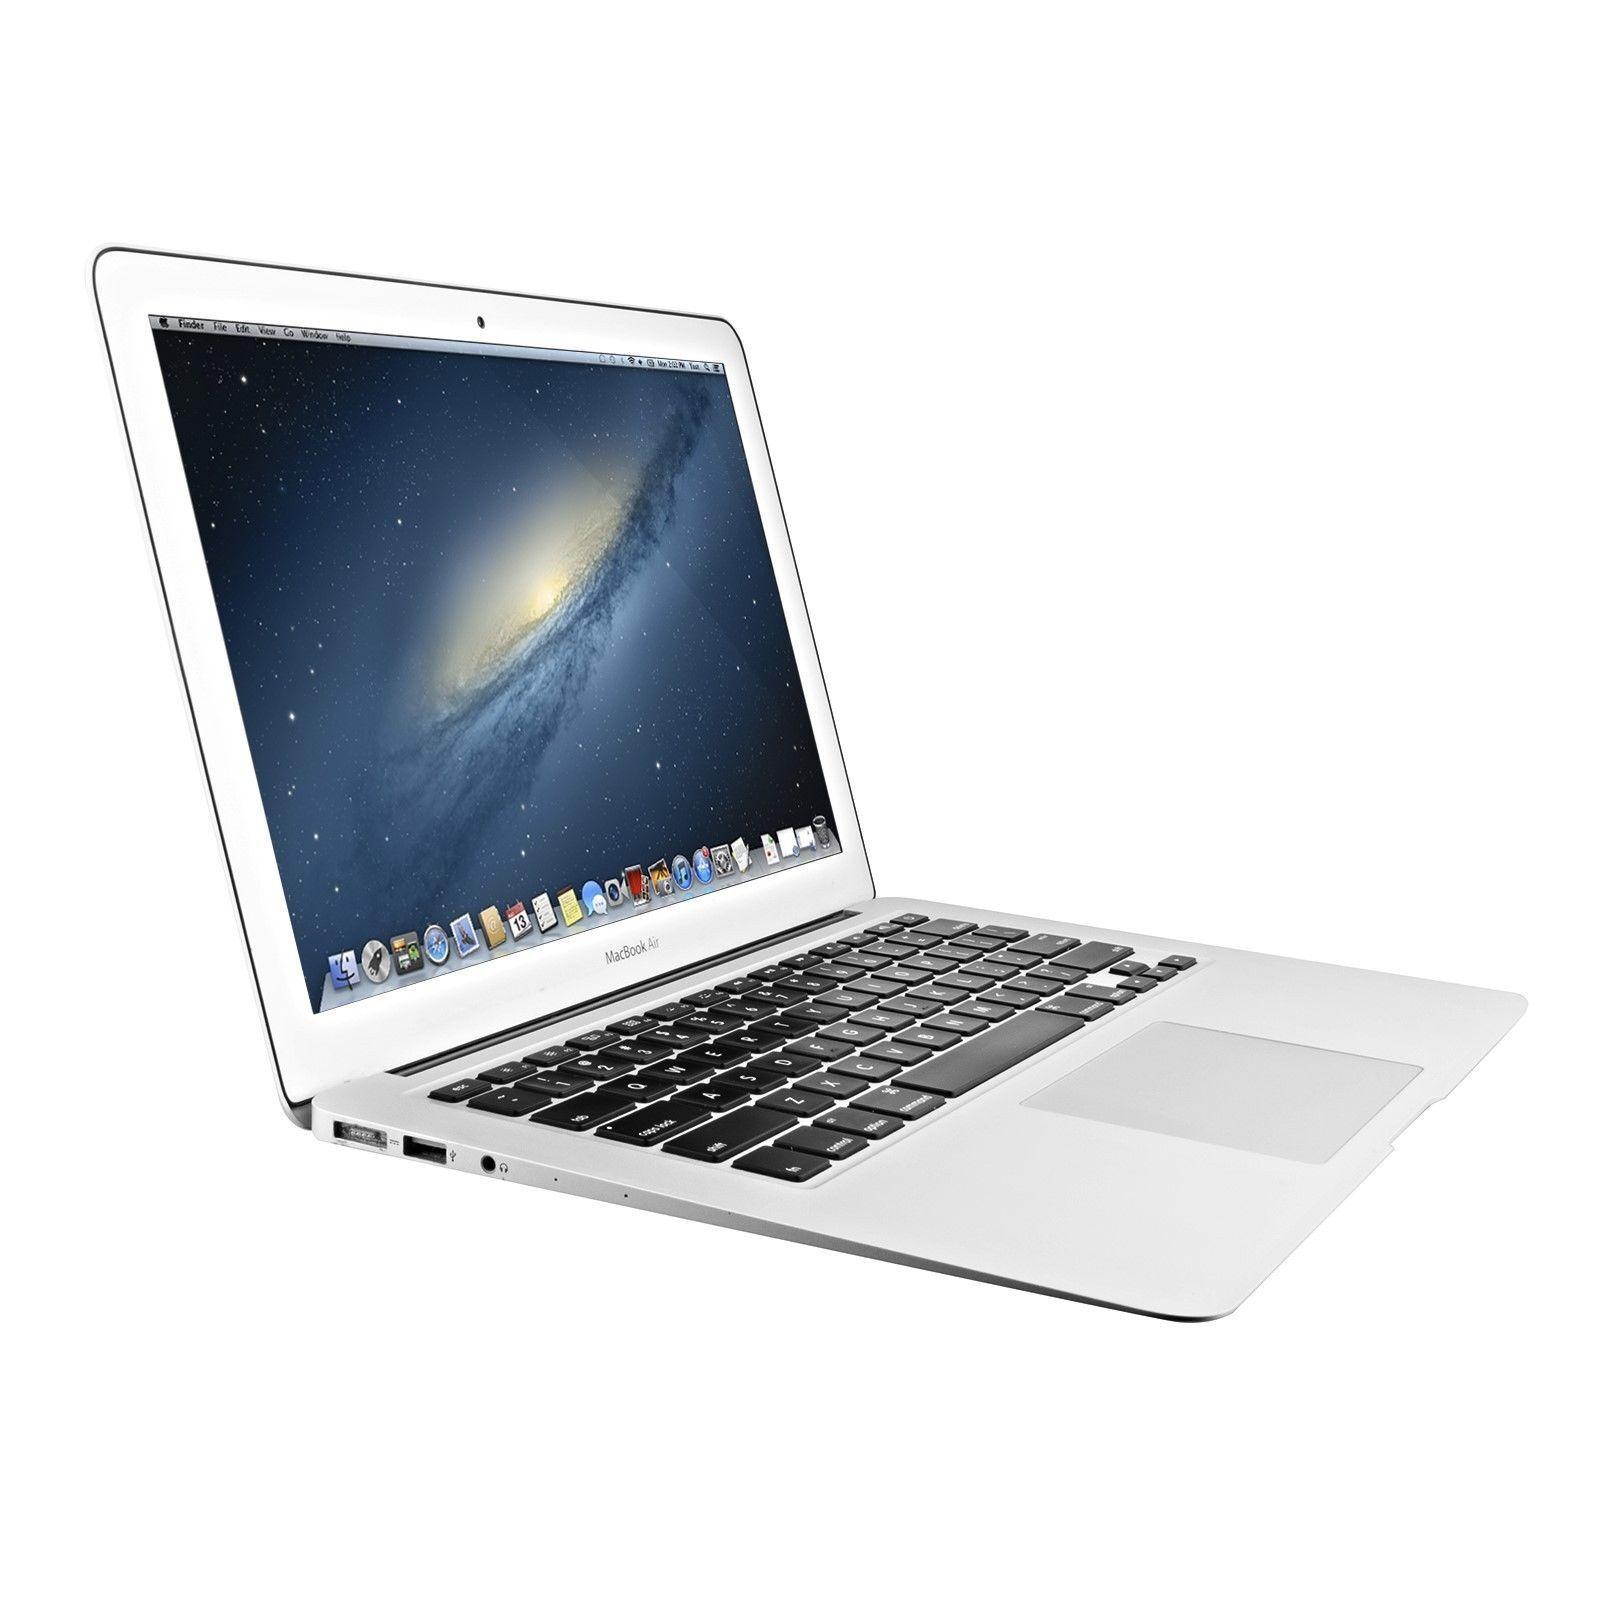 "Apple MacBook Air 7,2 i5@1.60GHz,8GB RAM,256GB SSD 13"" 2015 - 2"